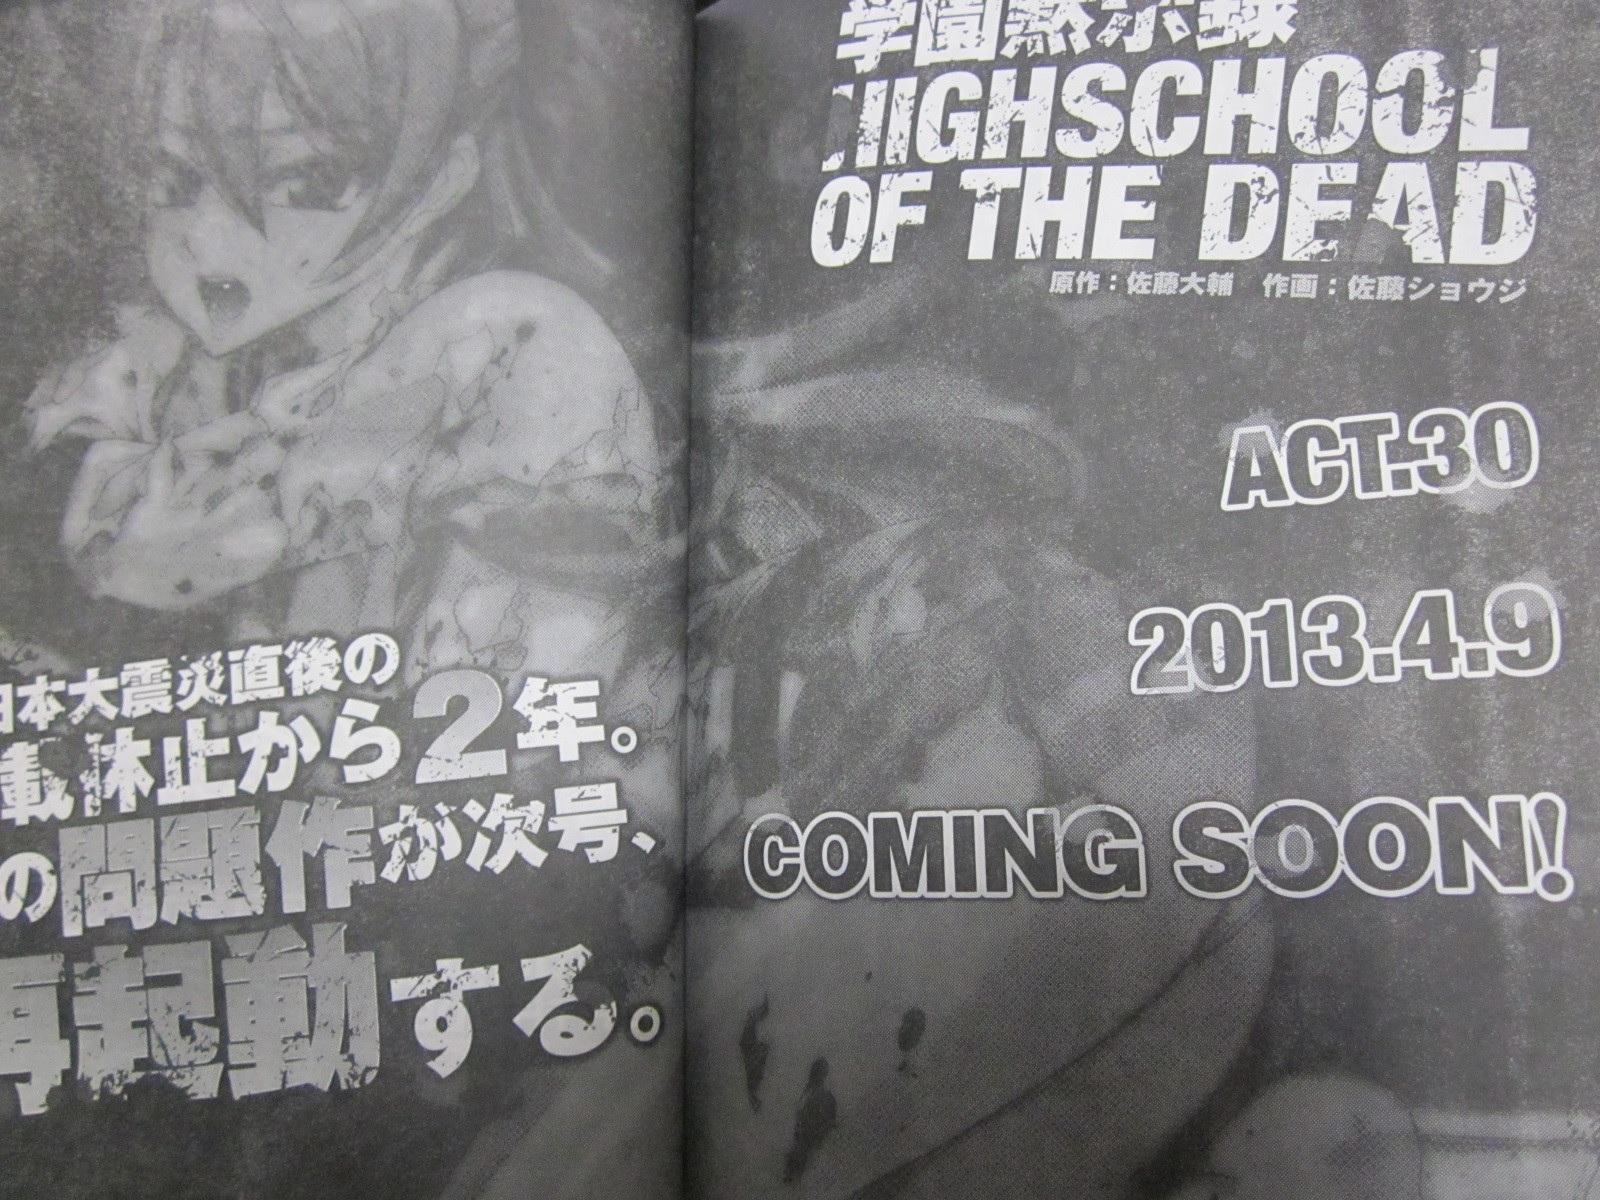 Highschool of the Dead Manga Hiatus Ending Soon Highschool-of-the-dead-return-date